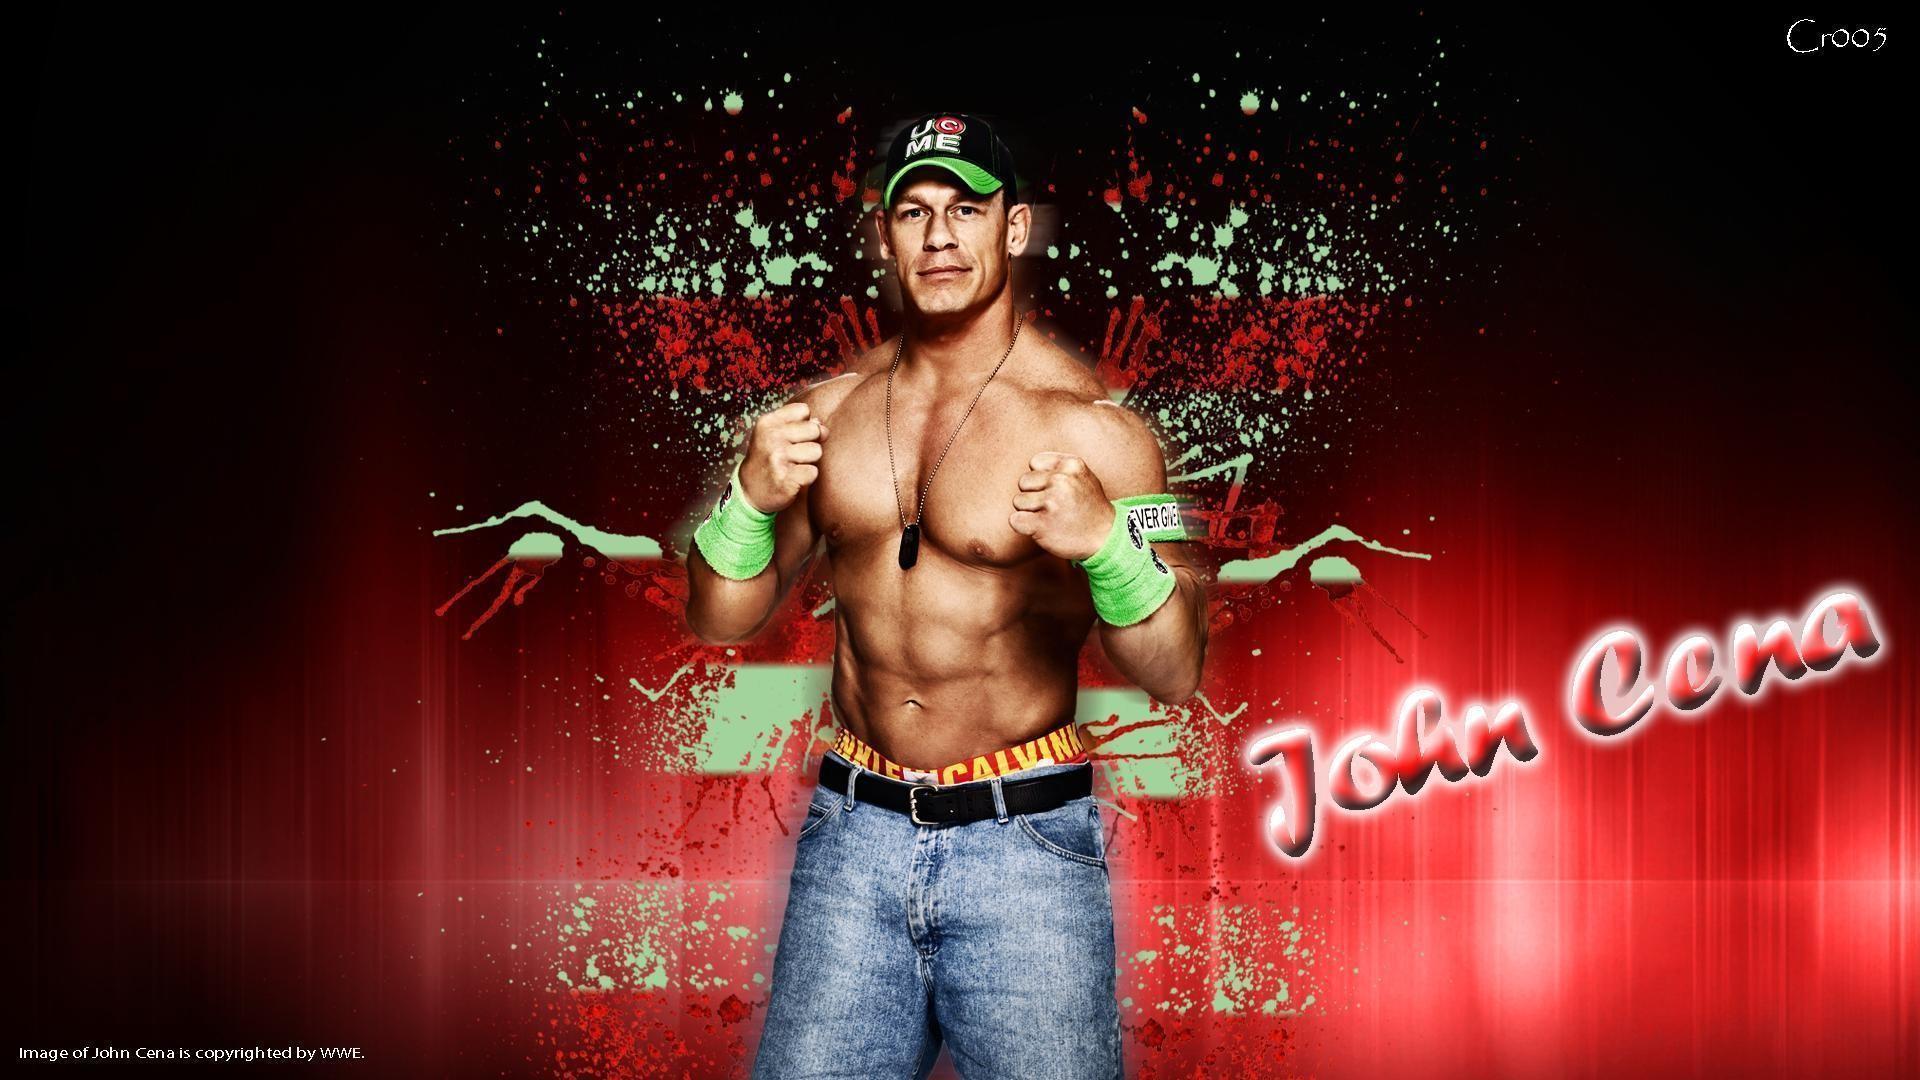 Wwe John Cena Wallpaper 2018 Hd 53 Images